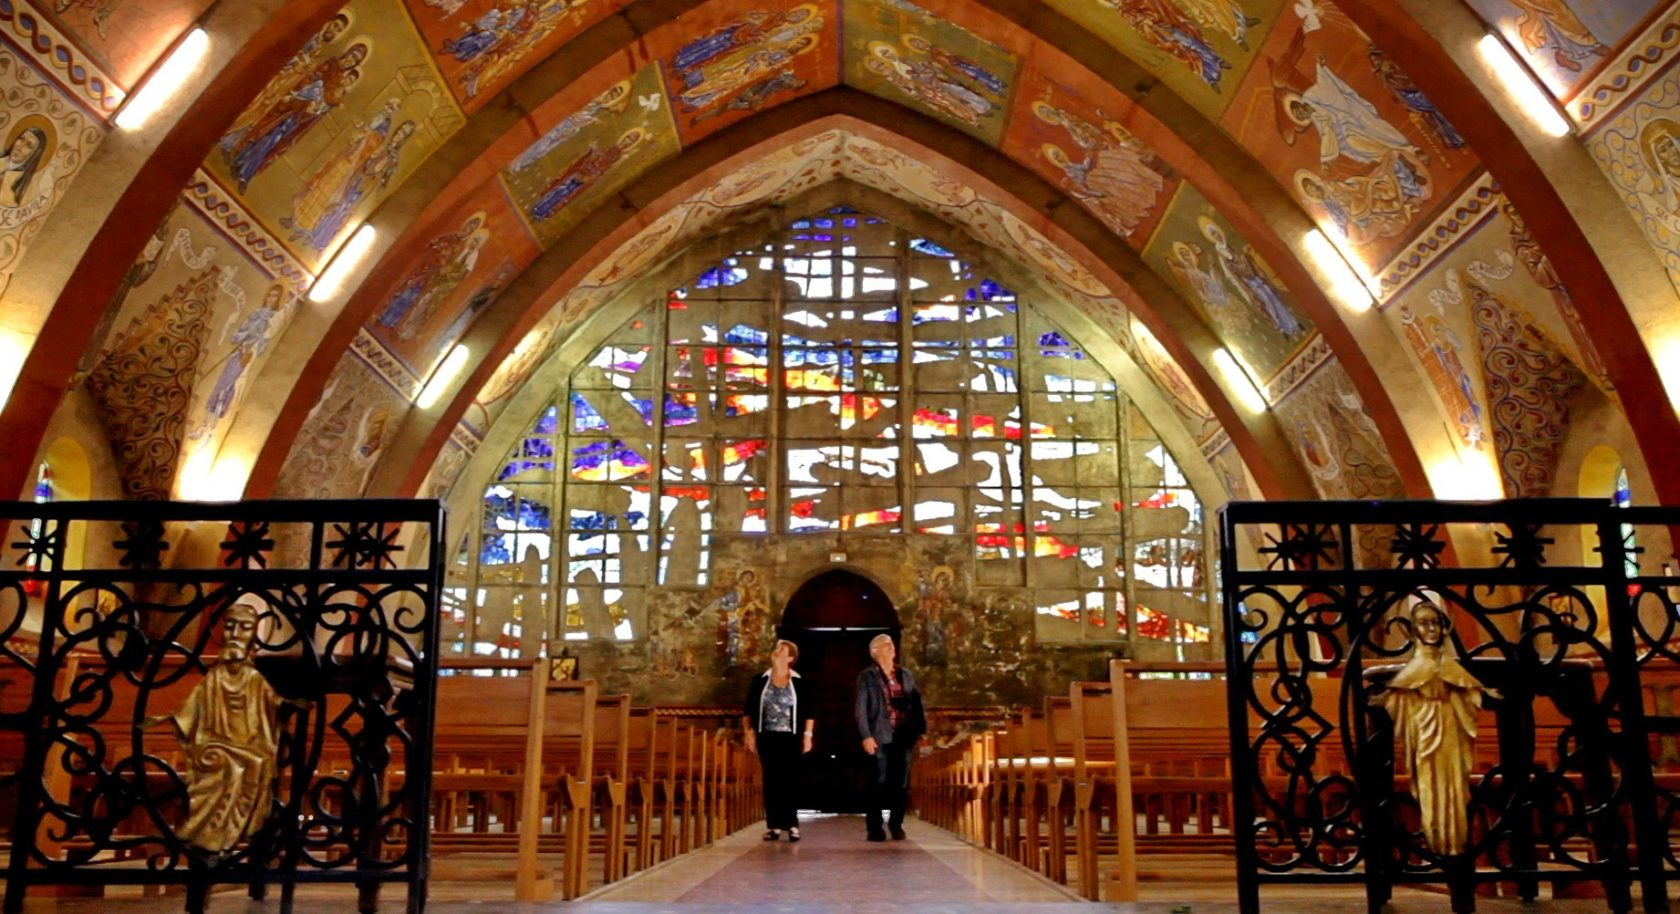 église d'Alban patrimoine gite de groupe culturel Albi Tarn